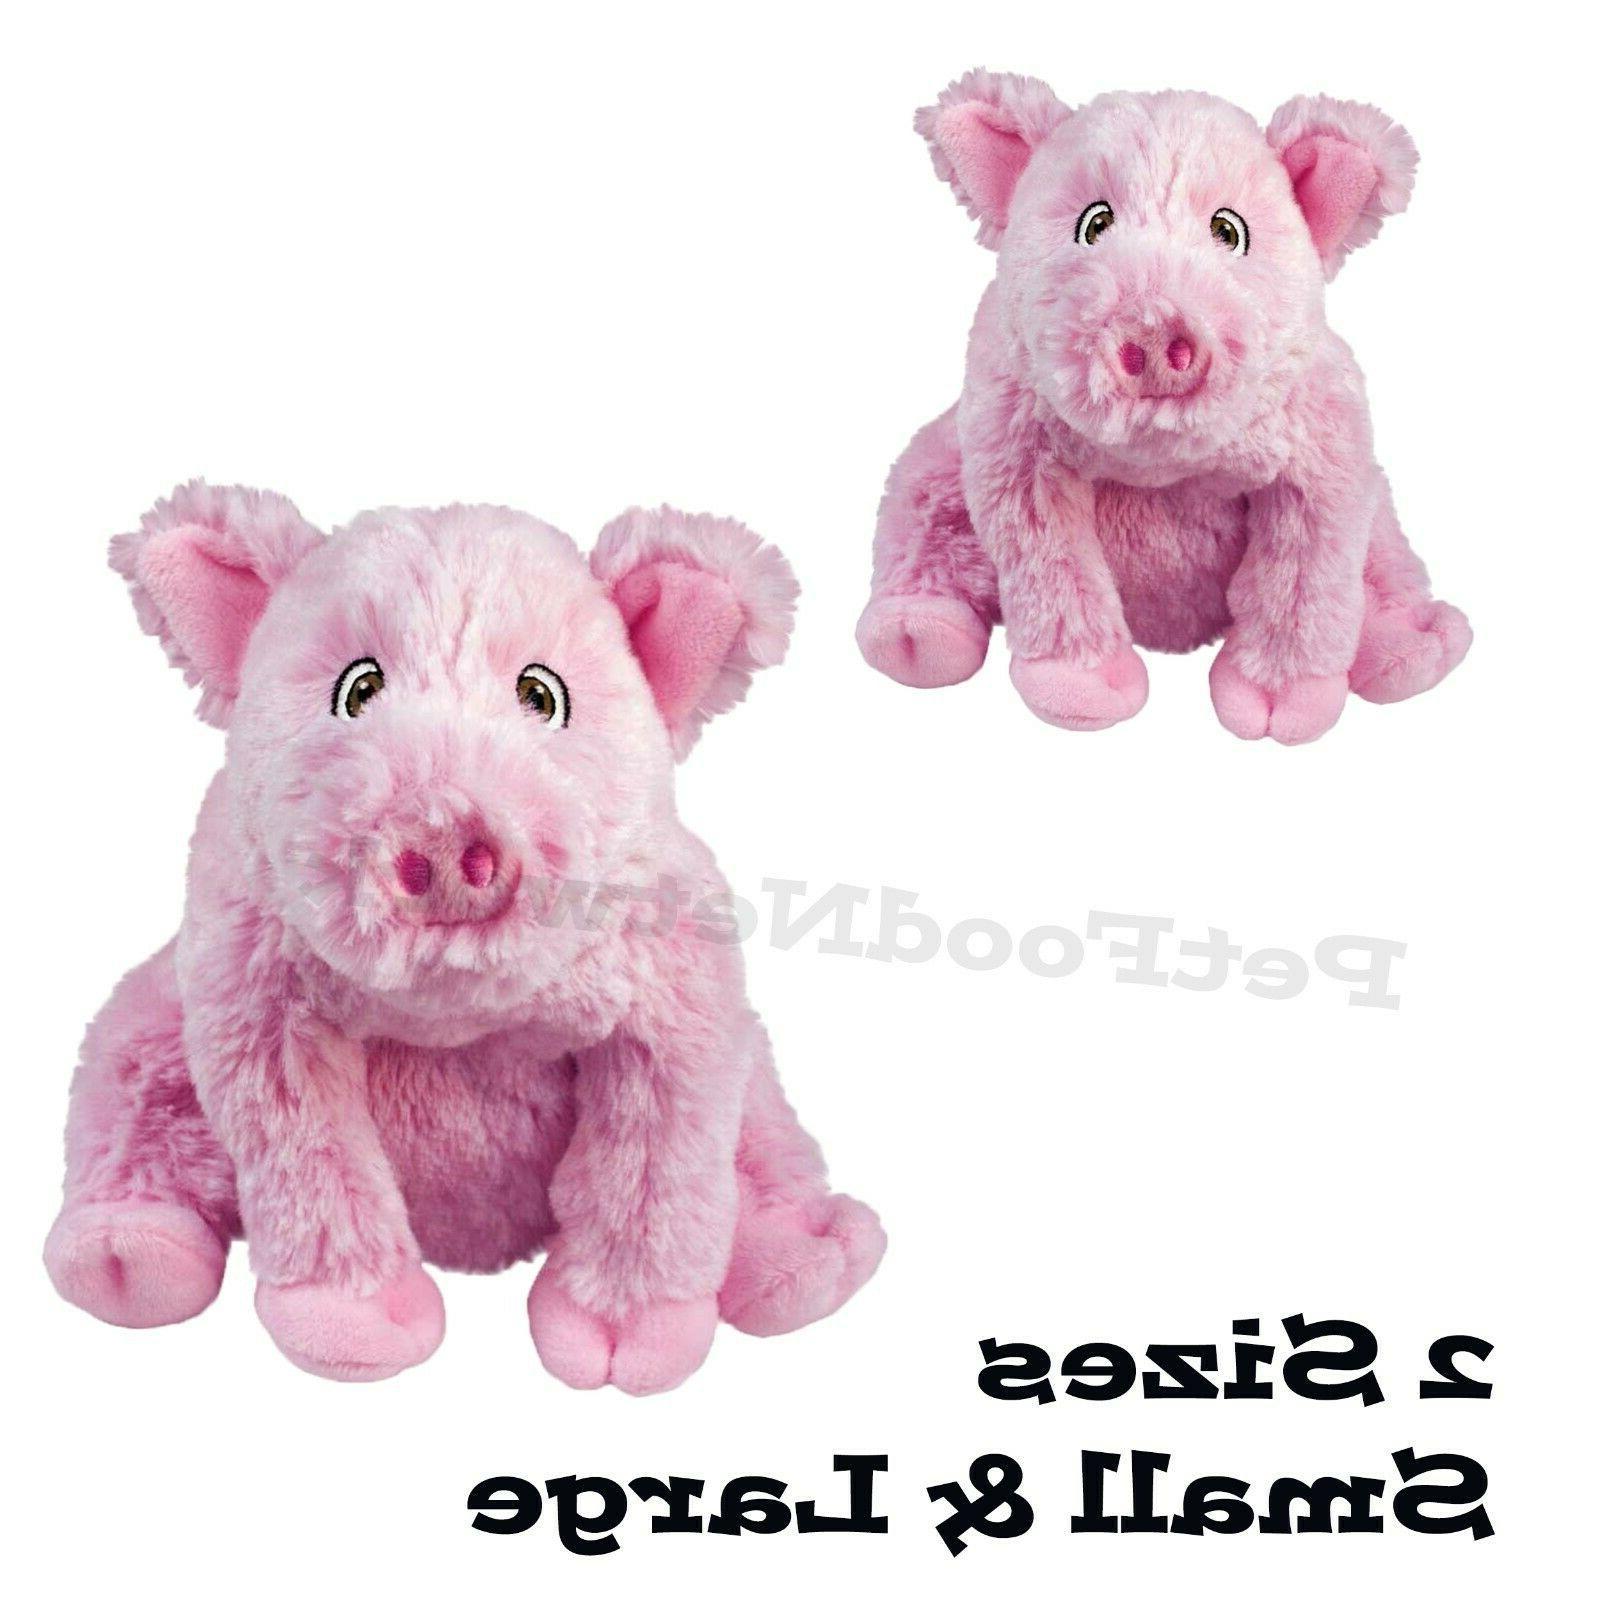 comfort kiddos dog toy pig free shipping